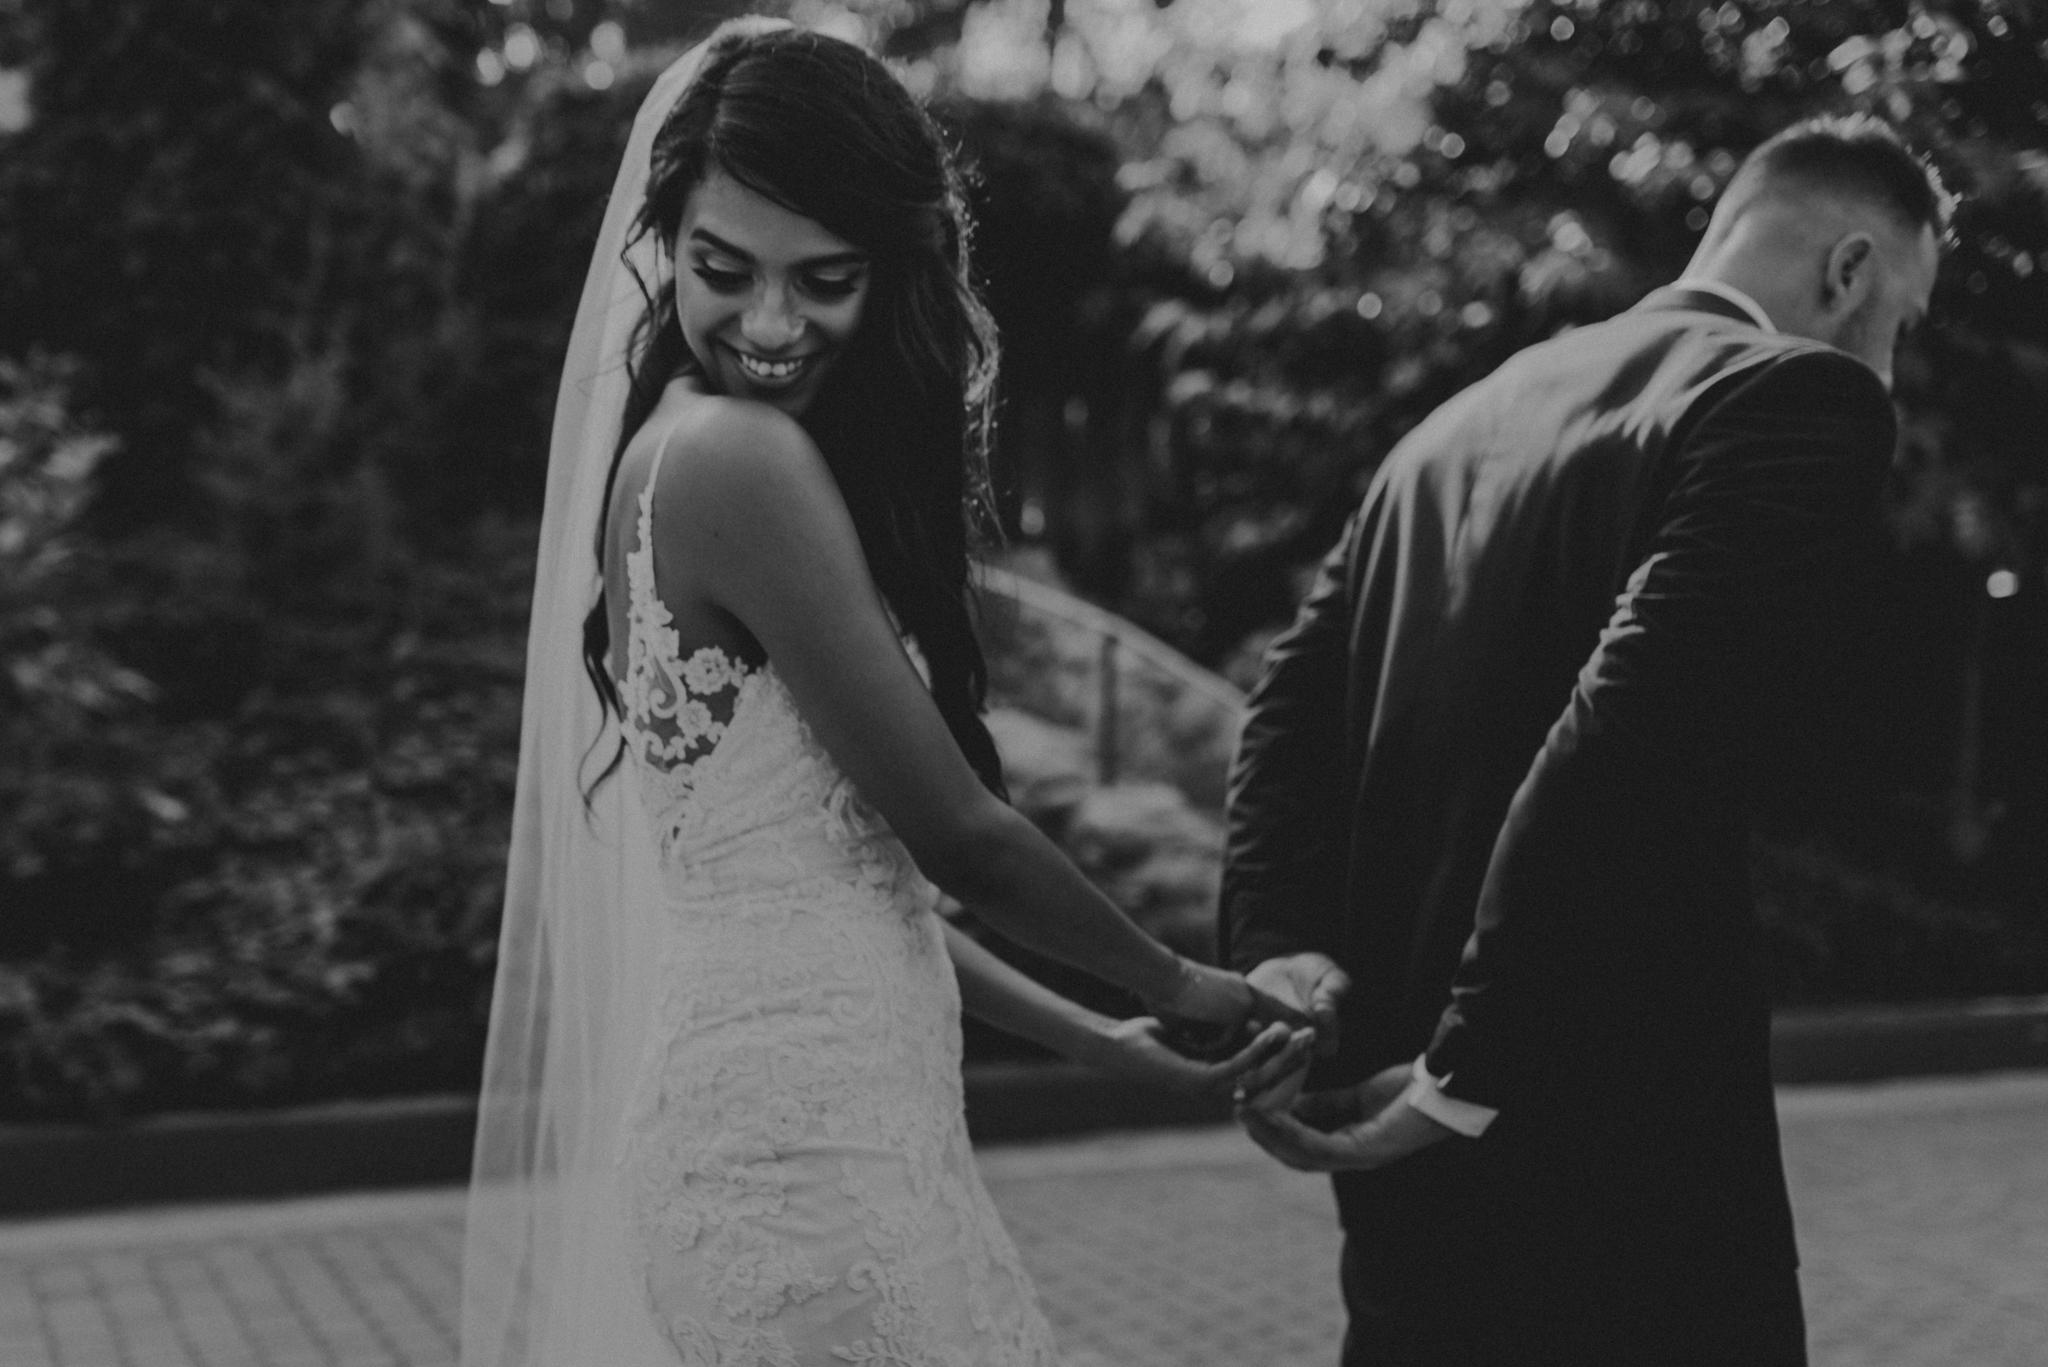 Isaiah + Taylor Photography - Rancho Las Lomas Wedding, Los Angeles Wedding Photographer-106.jpg